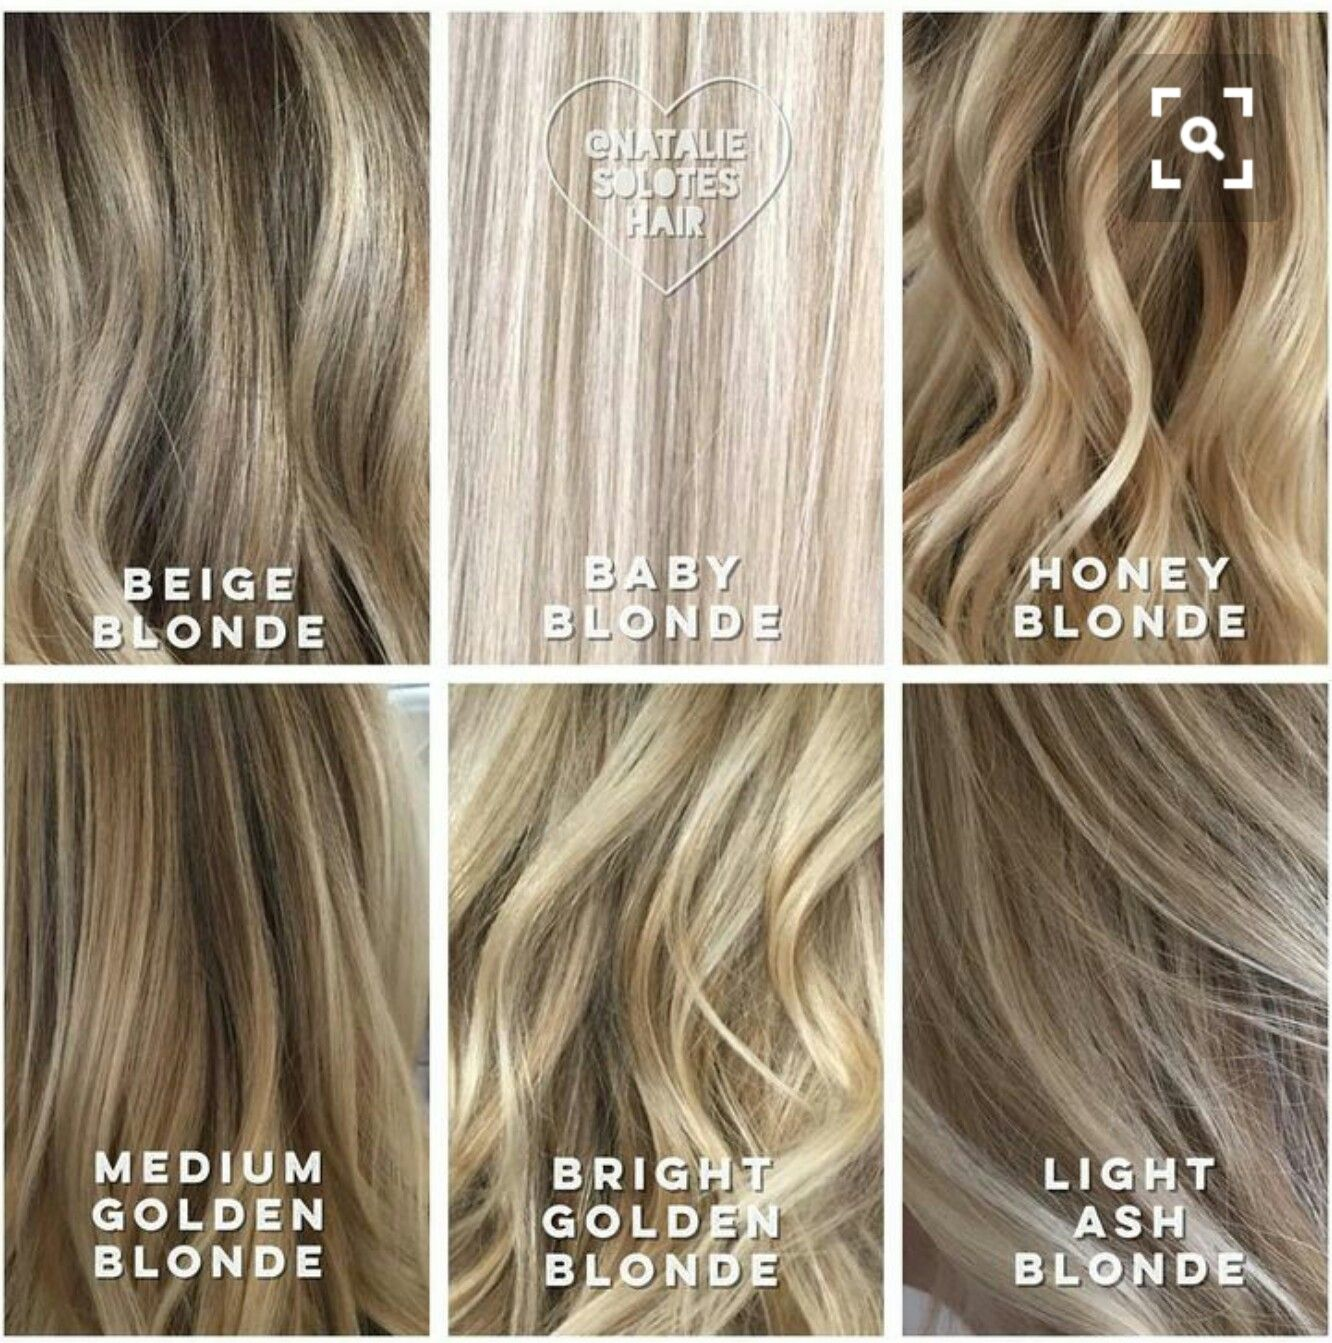 Shades Of Blonde Hair Styles Hair Hair Color